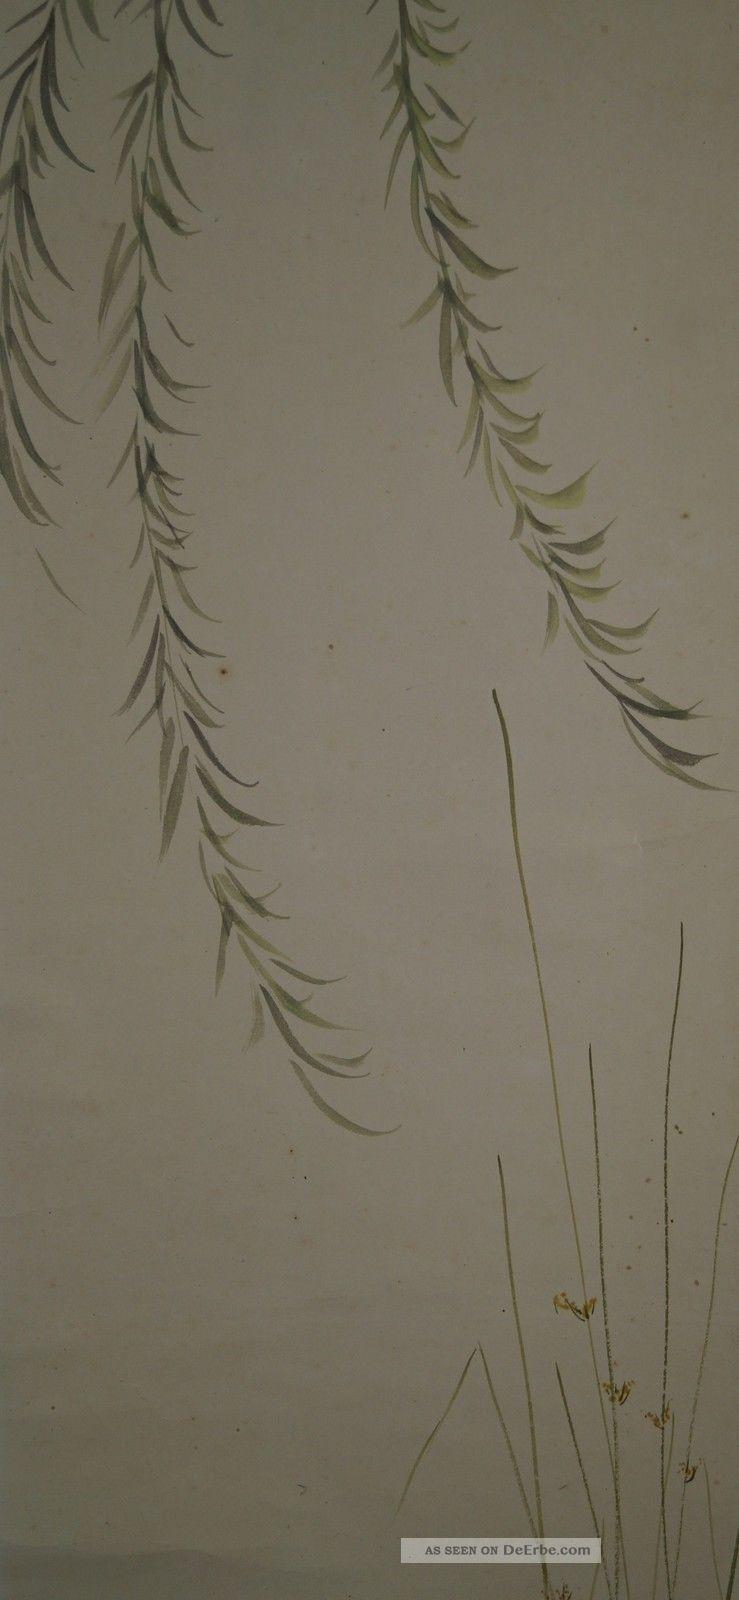 Antikes Japanisches Rollbild Kakejiku Weißer Reiher Japan Scroll 3605 Asiatika: Japan Bild